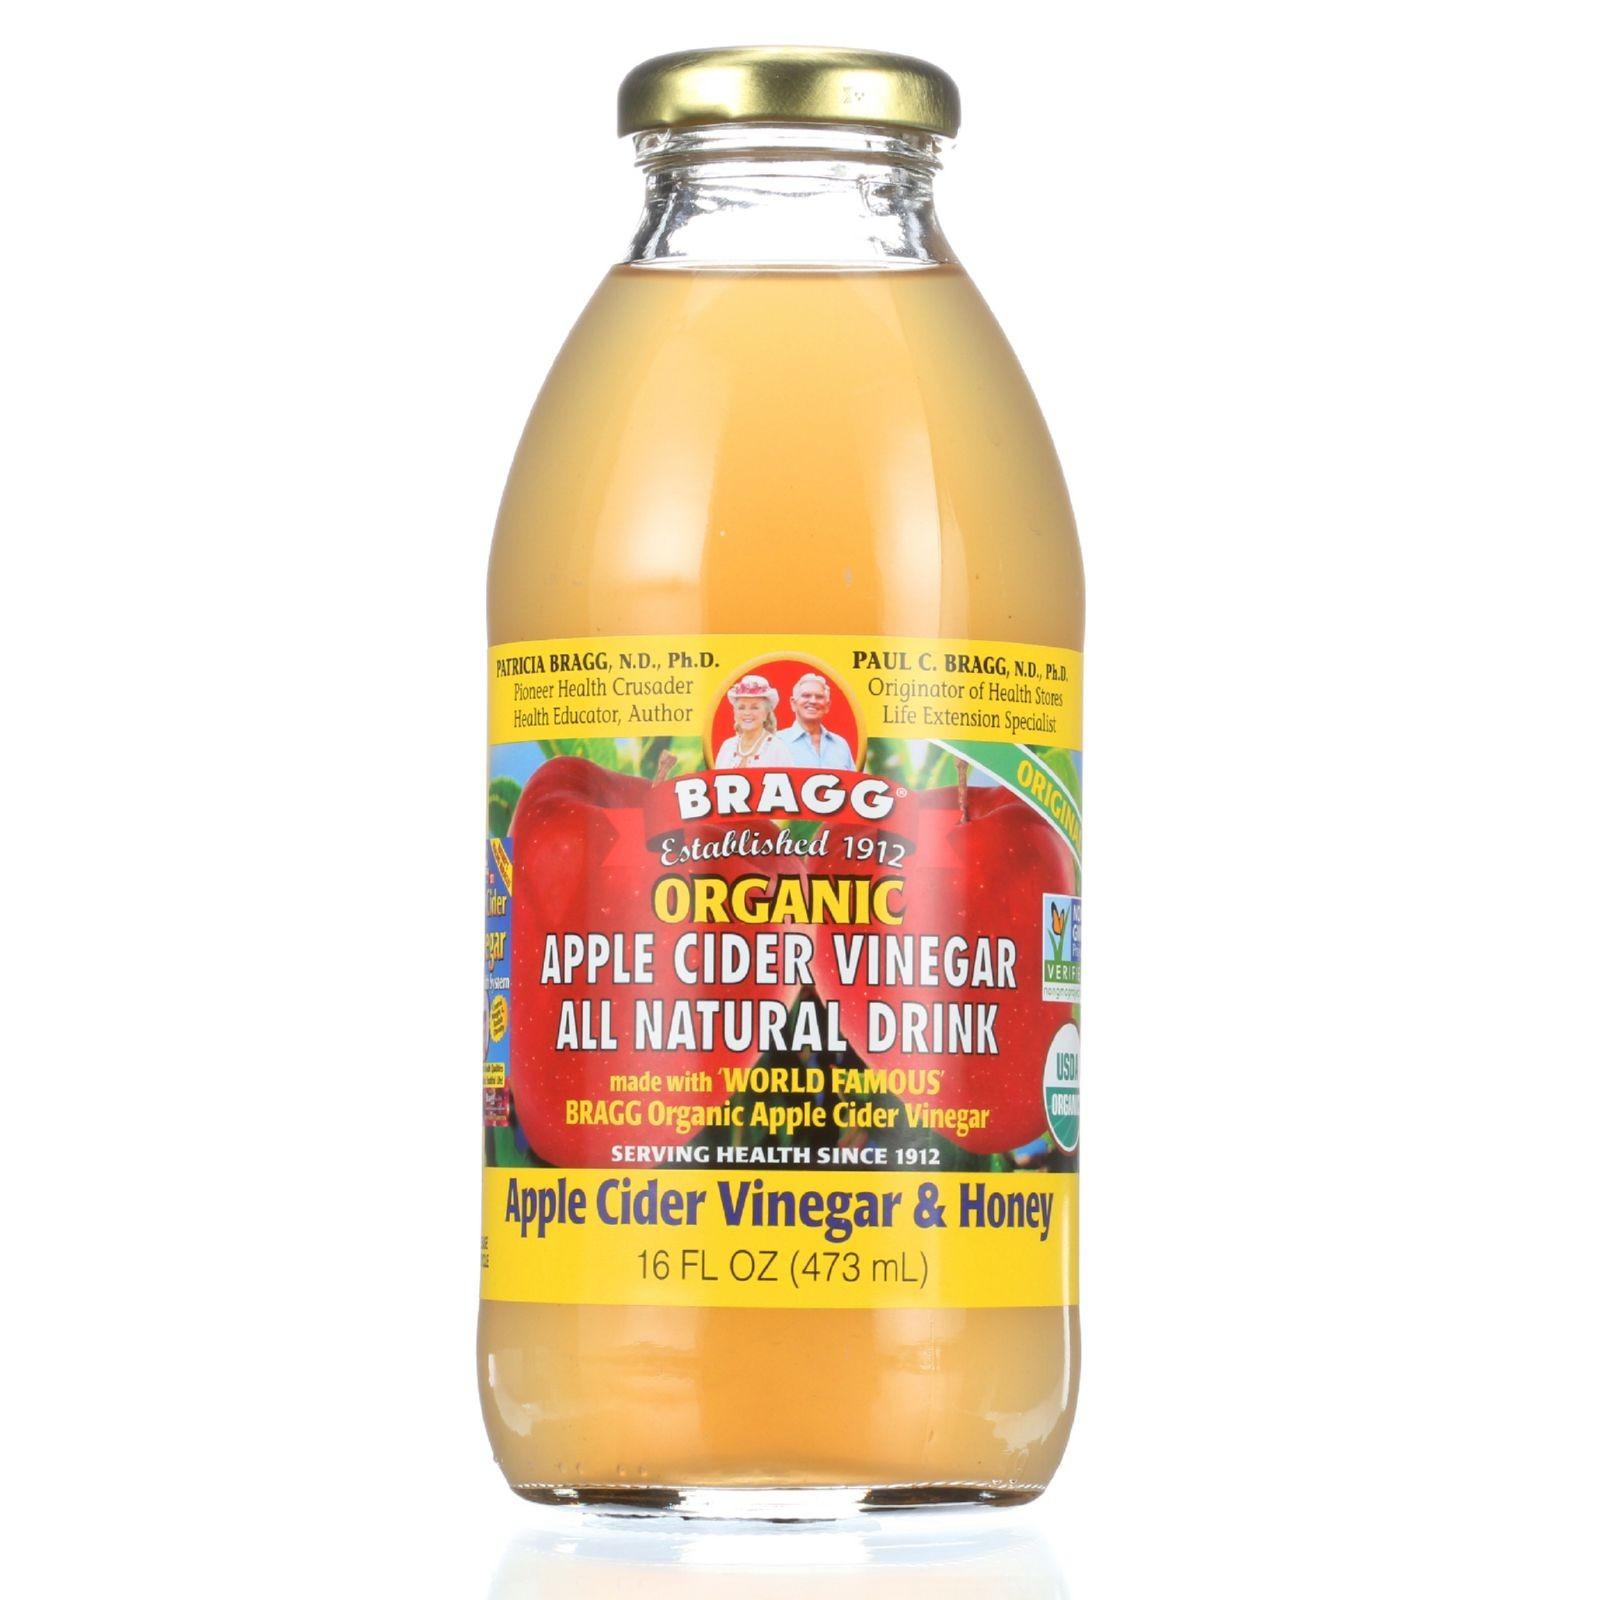 Braggs Apple Cider Vinegar Drink  Bragg Apple Cider Vinegar Drink Organic ACV and Honey